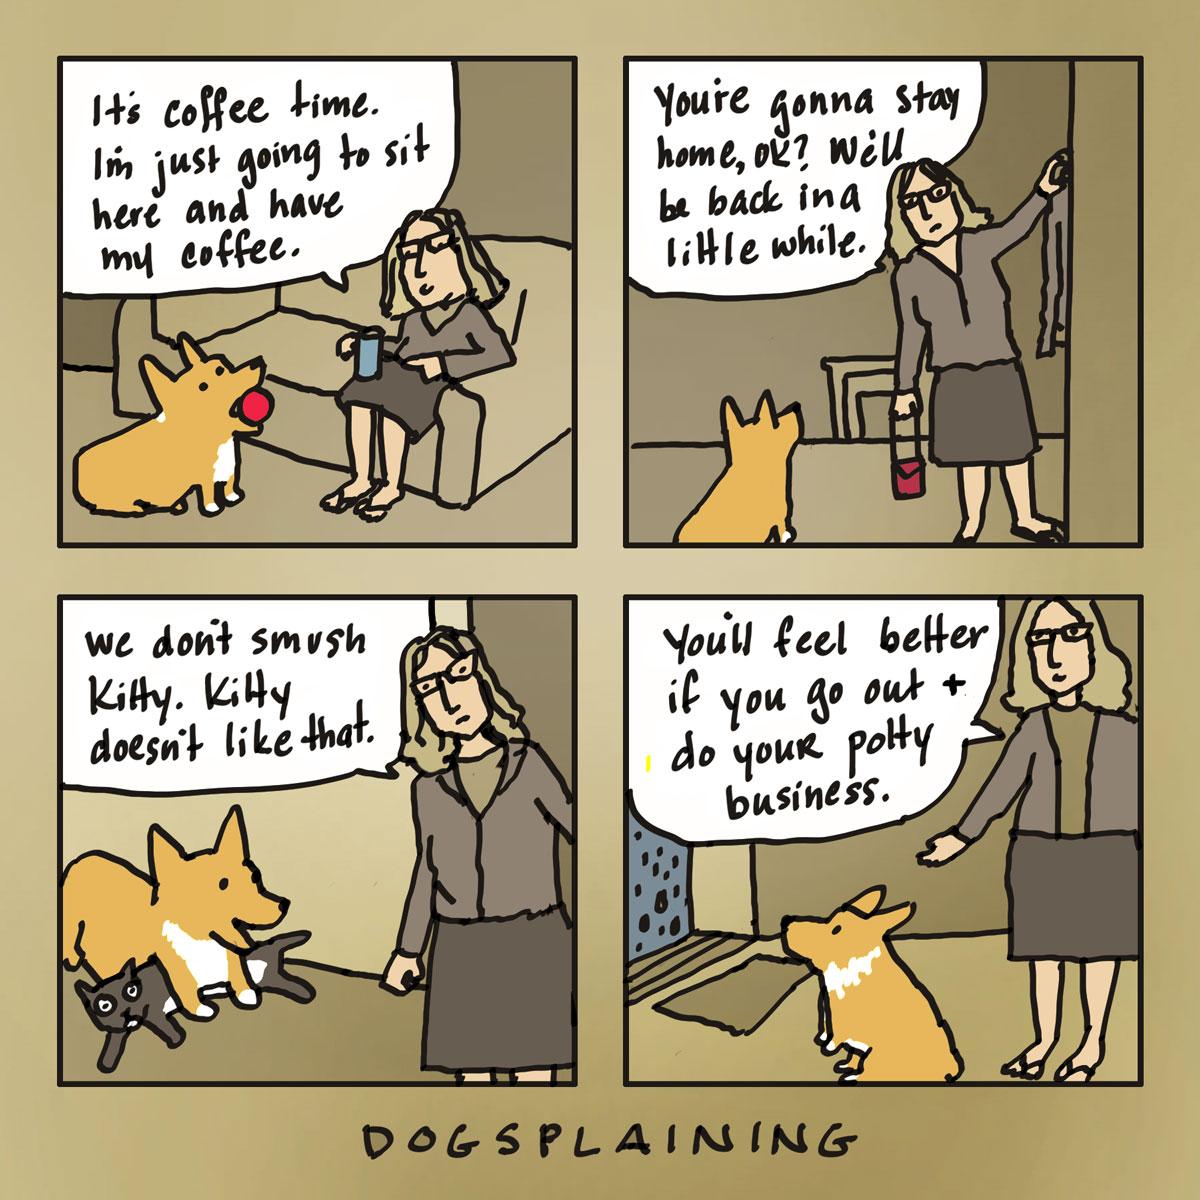 Dogsplaining